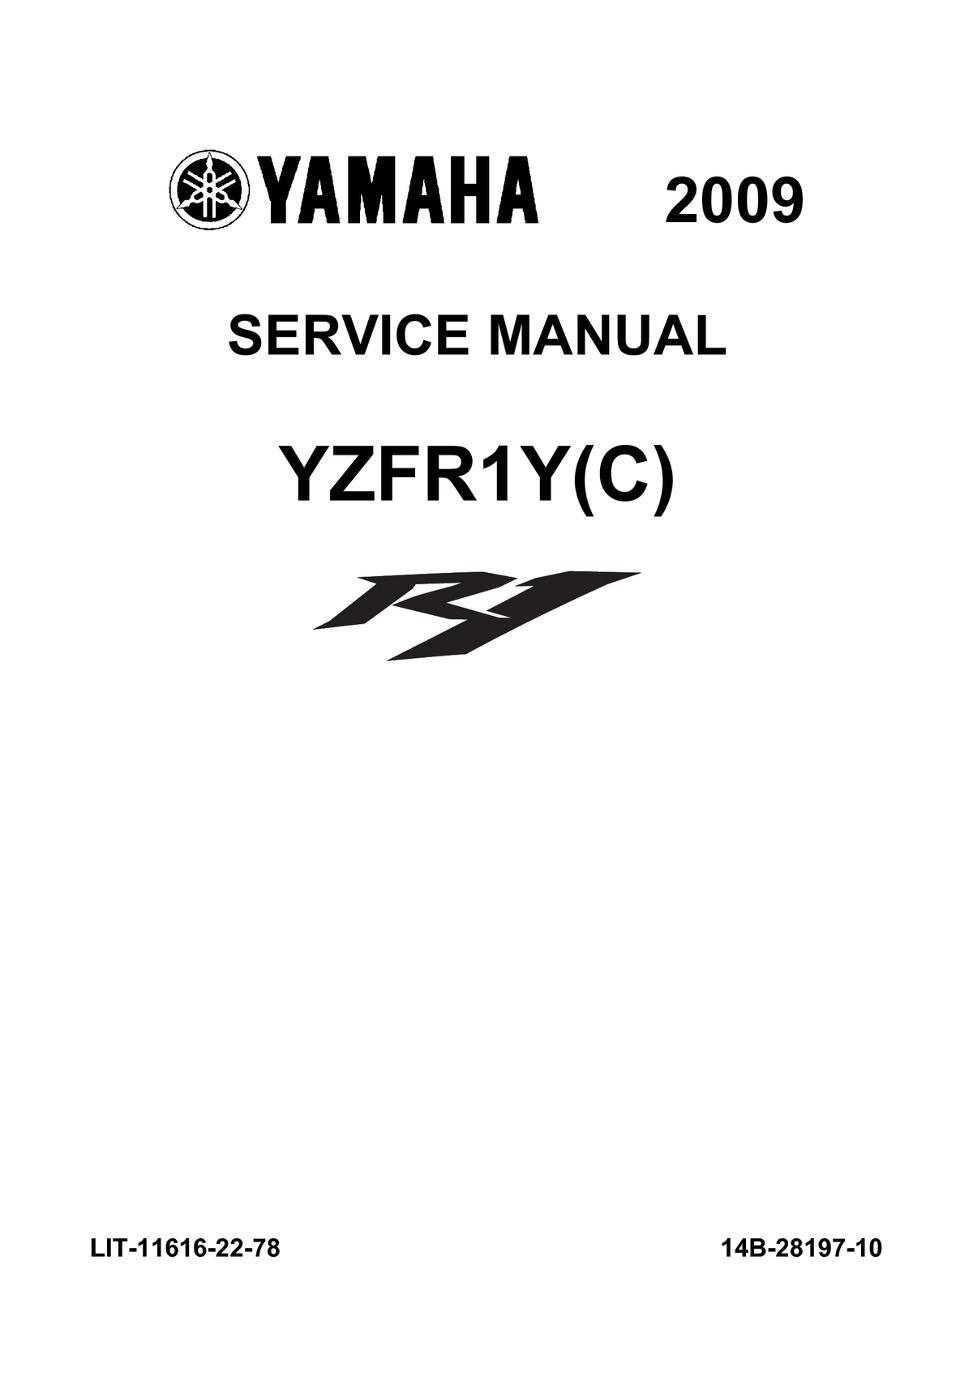 medium resolution of yamaha r1 2009 service manual flat 2009 yamaha r1 wiring diagram 2009 yamaha r1 wiring diagram